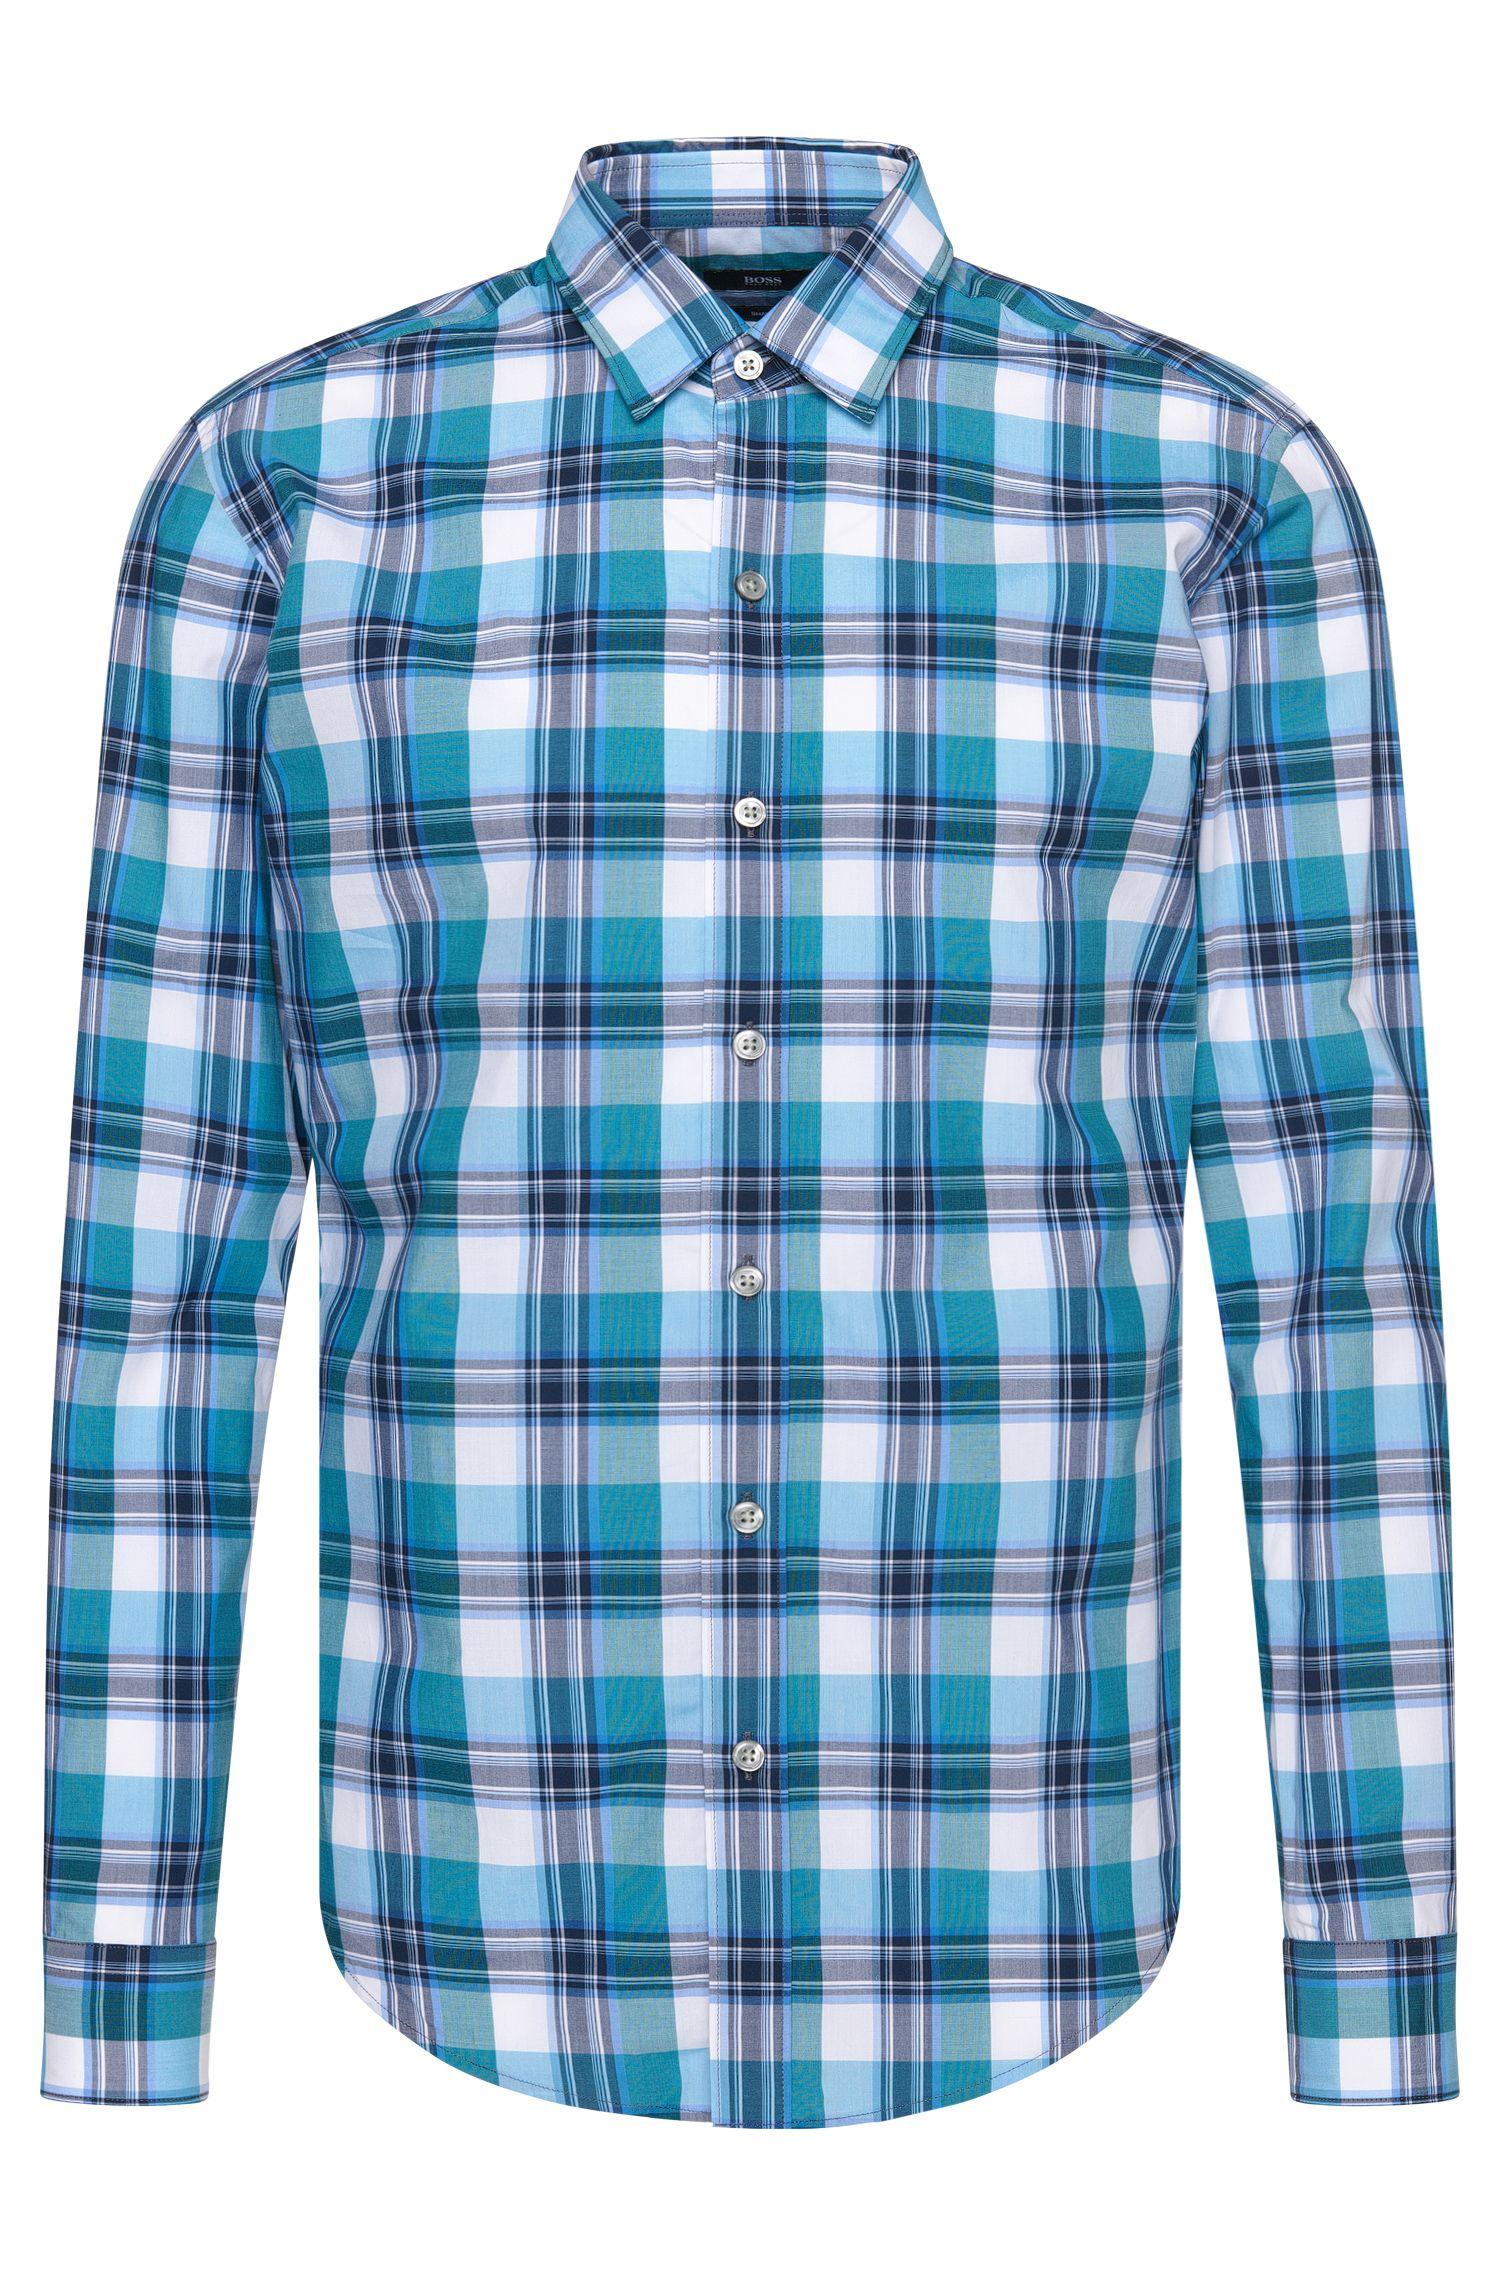 Cotton Button Down Shirt, Slim Fit | Robbie